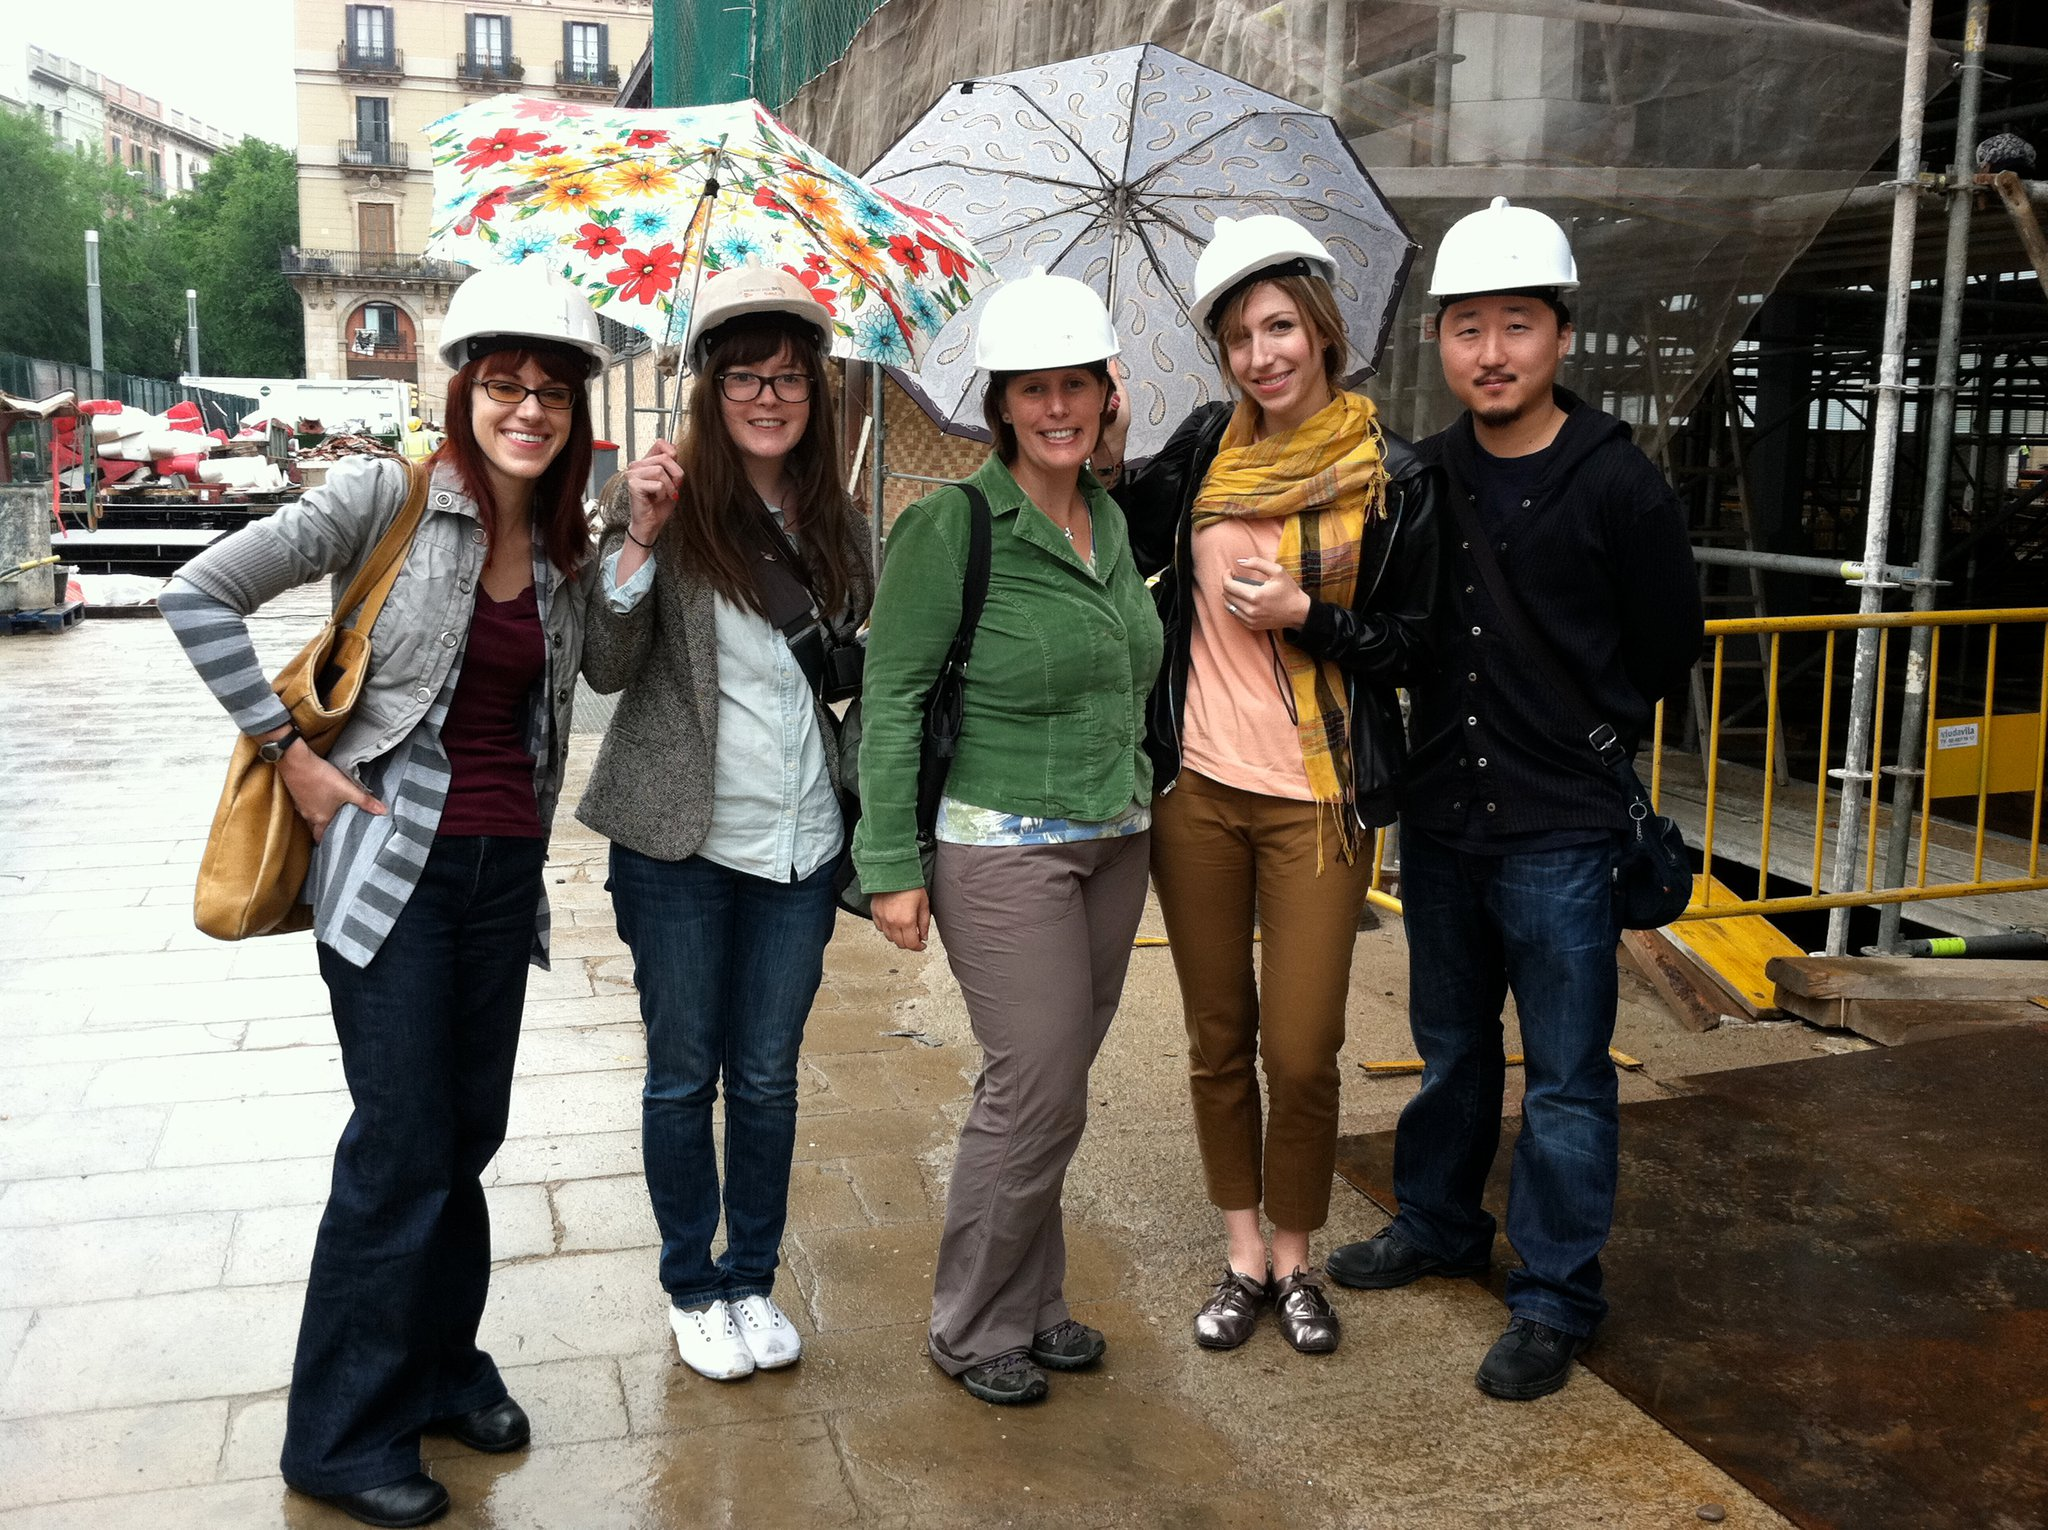 An image of: Field study in Barcelona, 2011: Dana Johnson, Grace Cleary, Jill Bierly, Mackenzie Jackson, Seung ho Chung